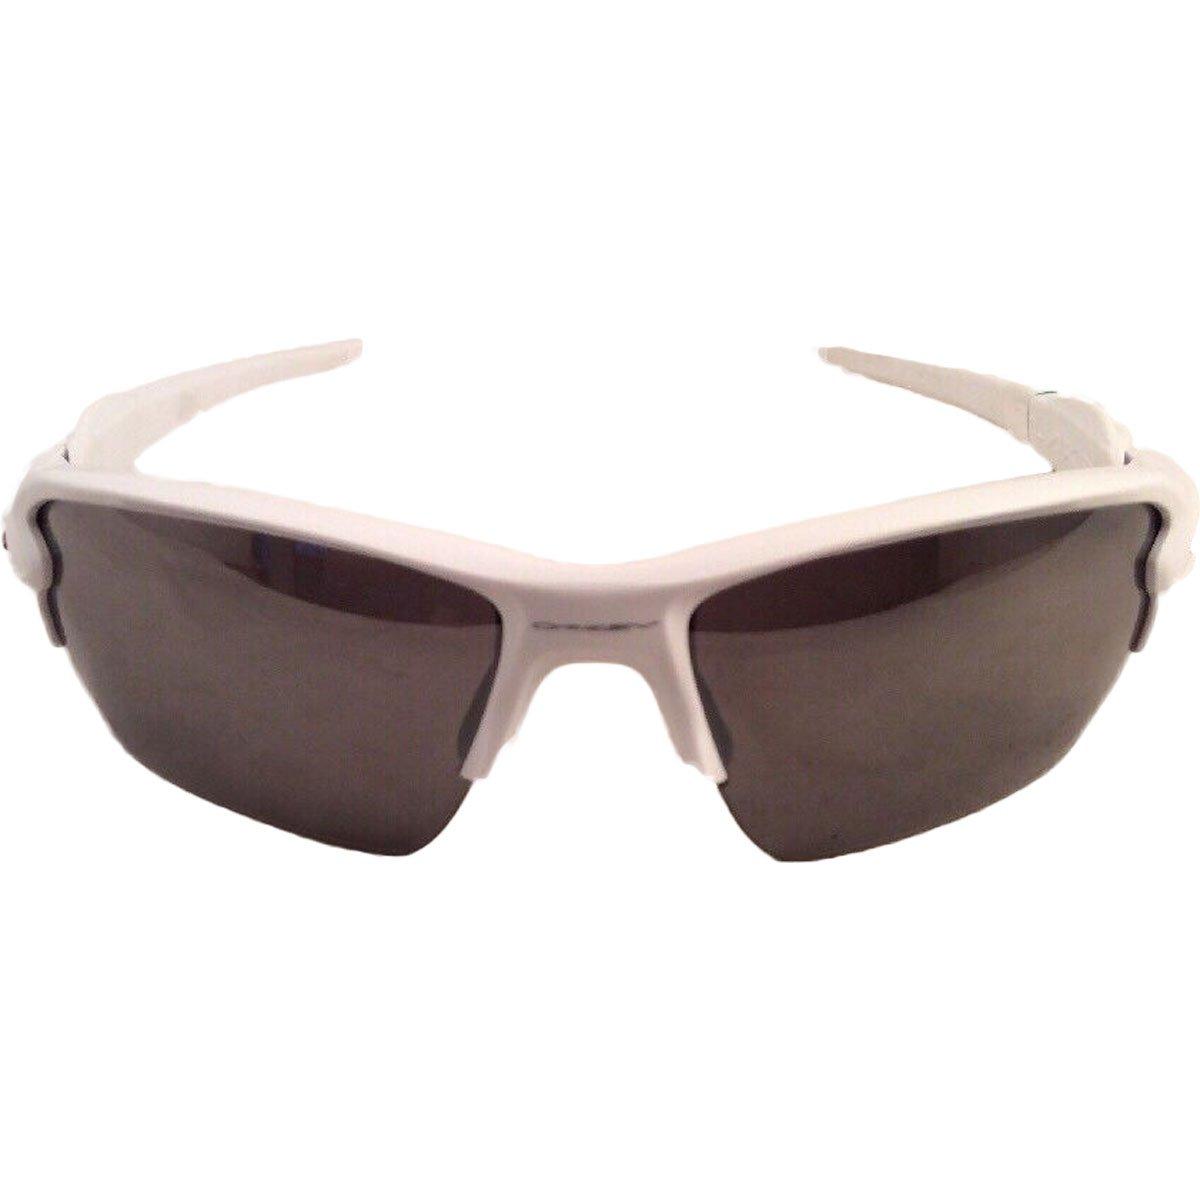 Oakley Flak 2.0 XL Sunglasses,Polished White